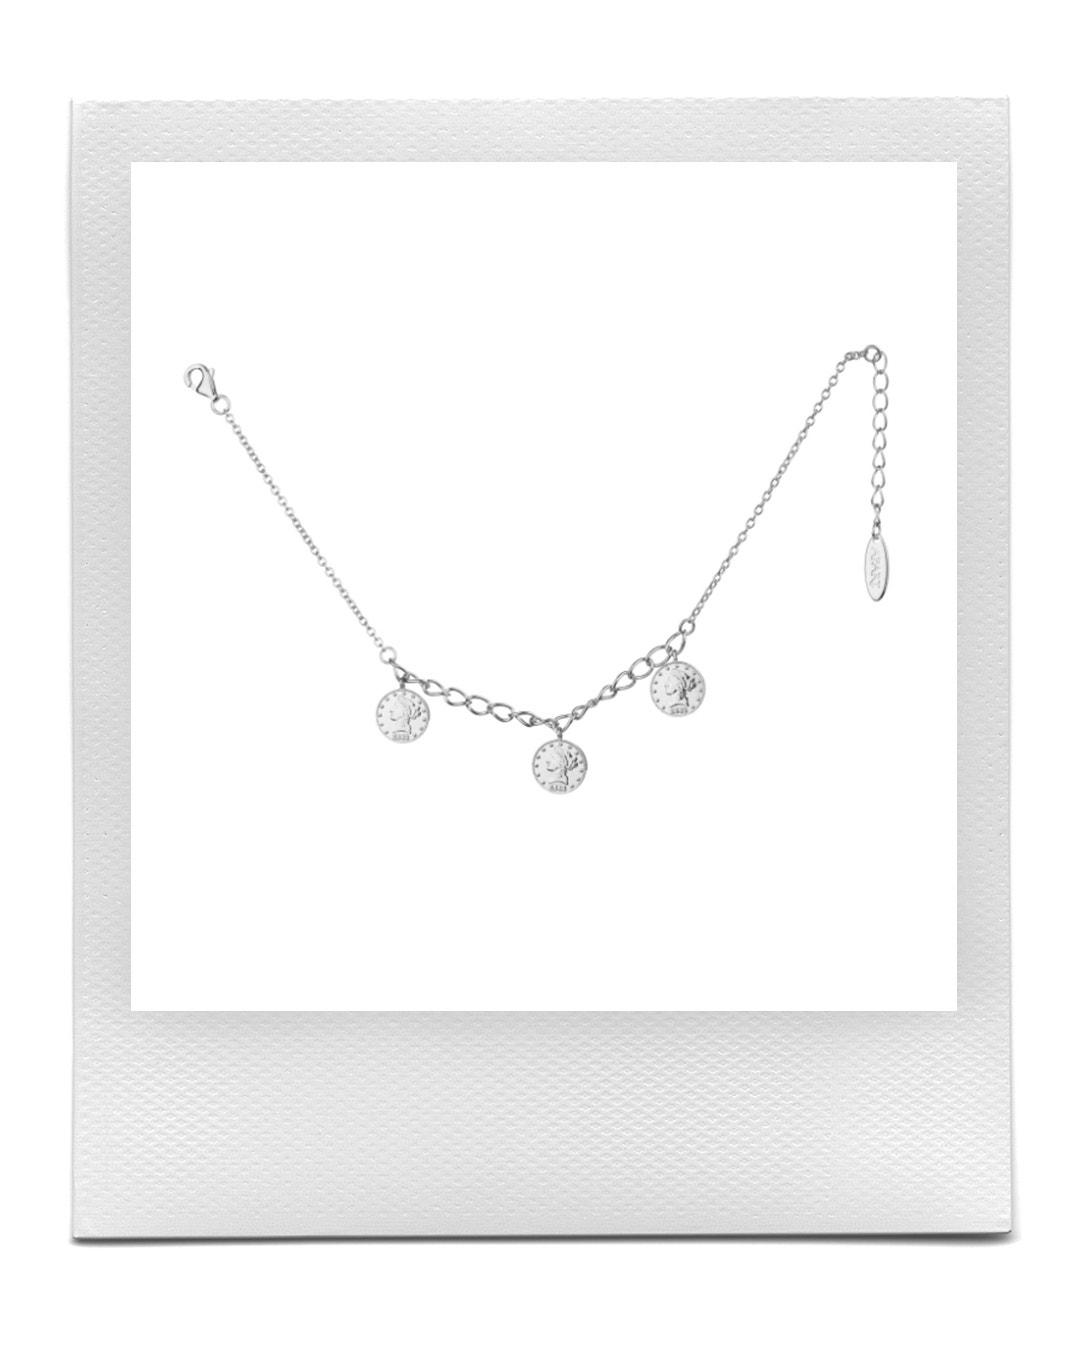 Stříbrný náramek s mincemi, Apart  prodává Apart, 1 169 Kč